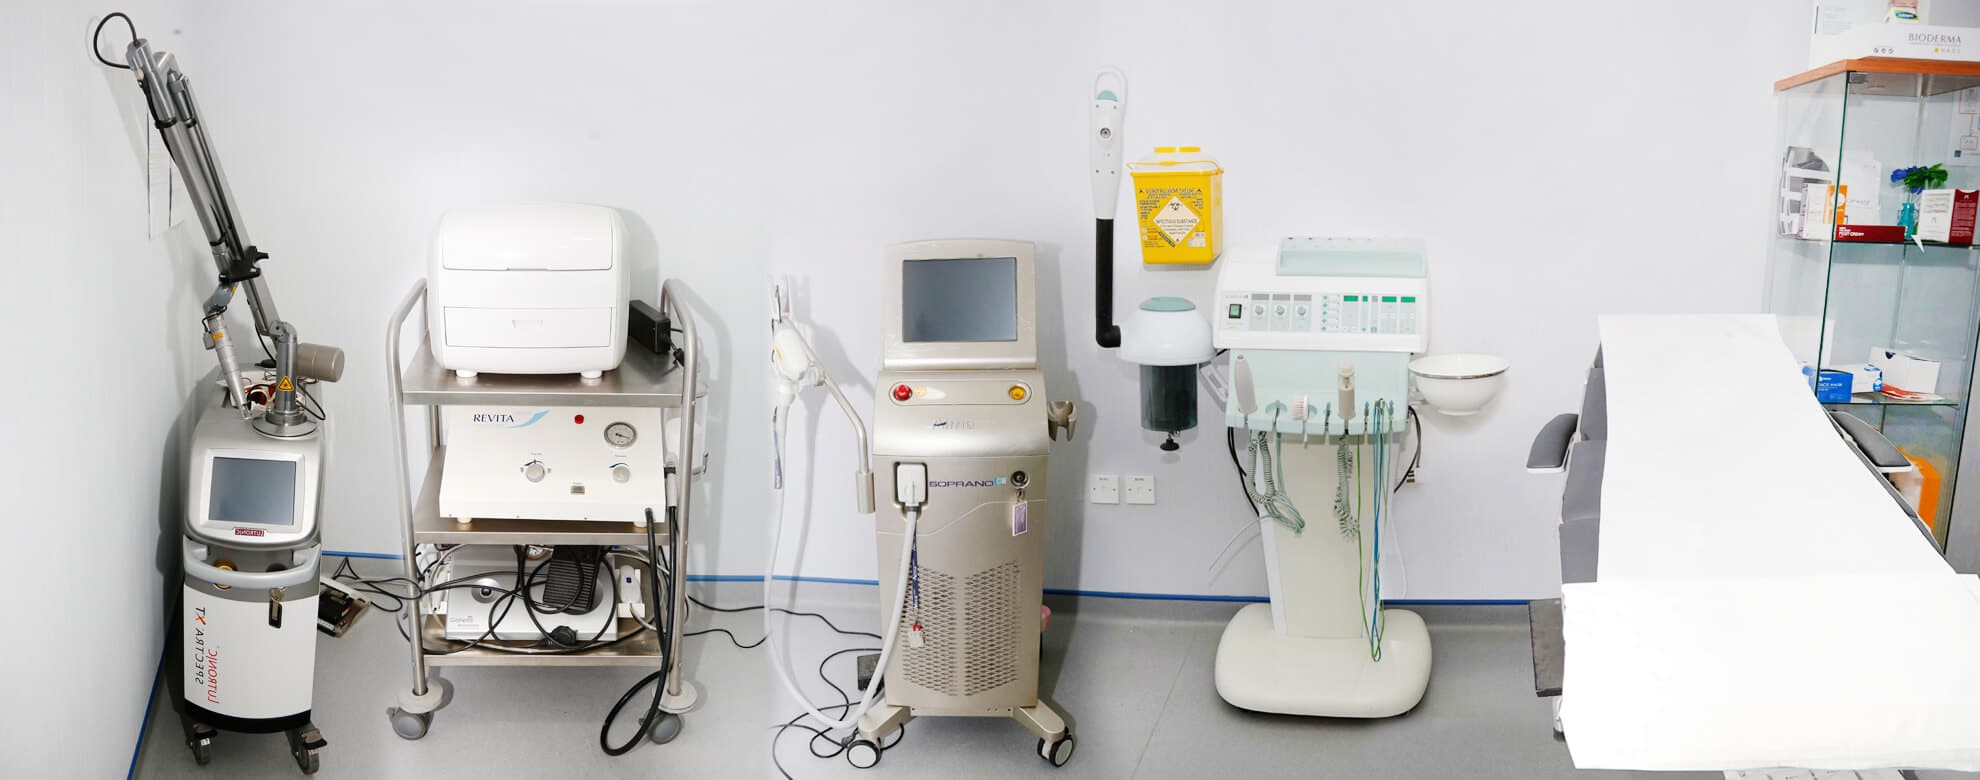 Dermatology Speciality